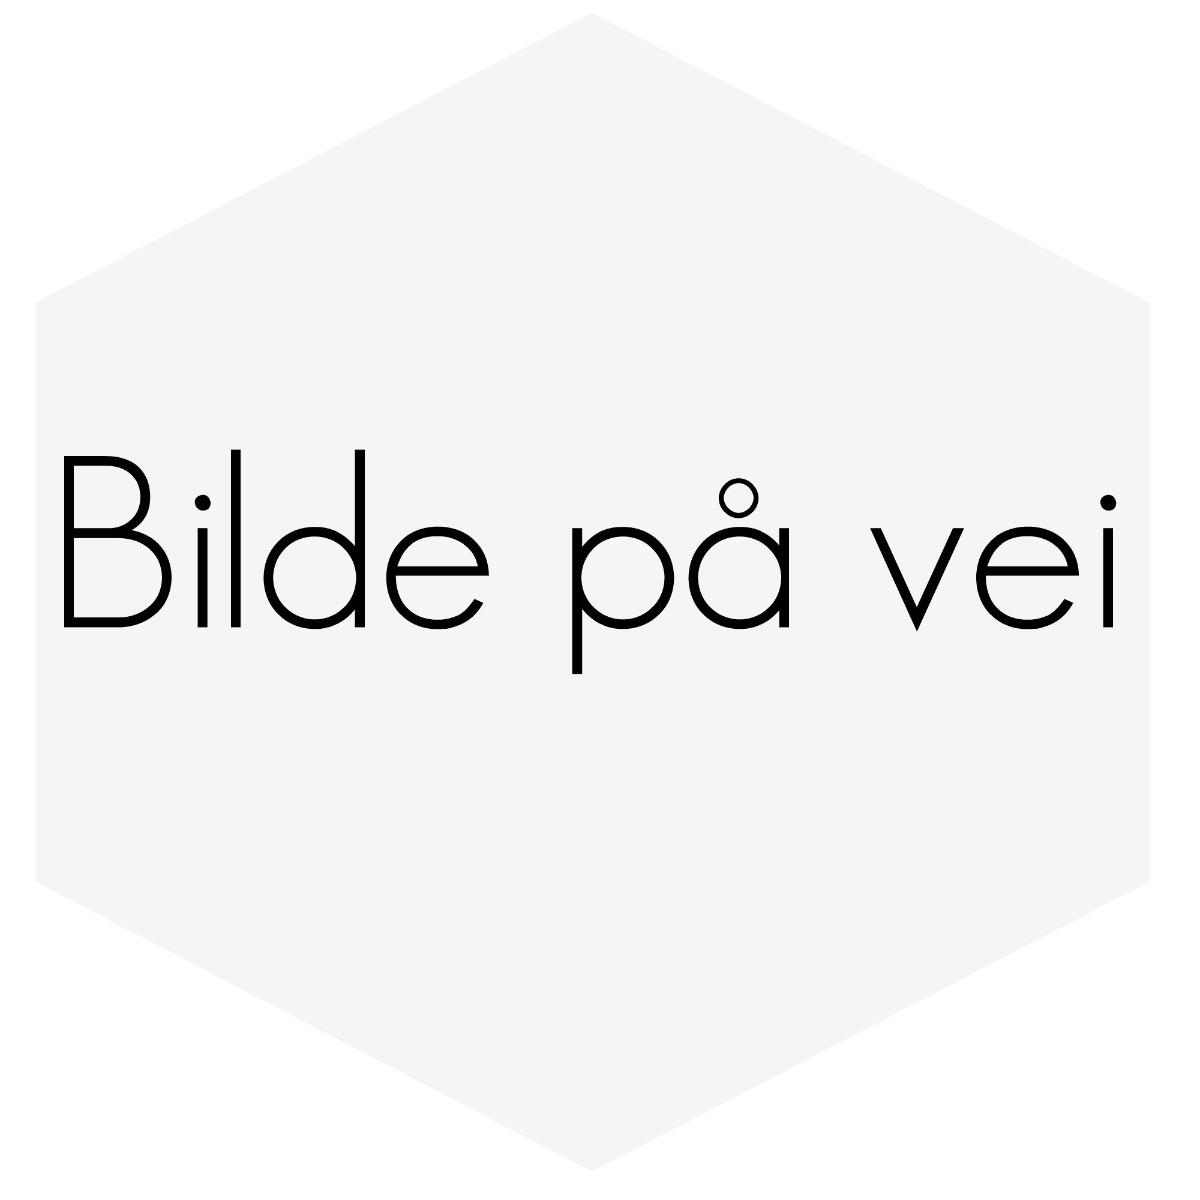 VINDAVVISERSETT AUDI A4(B5) 4D 95-01MOD SEDAN